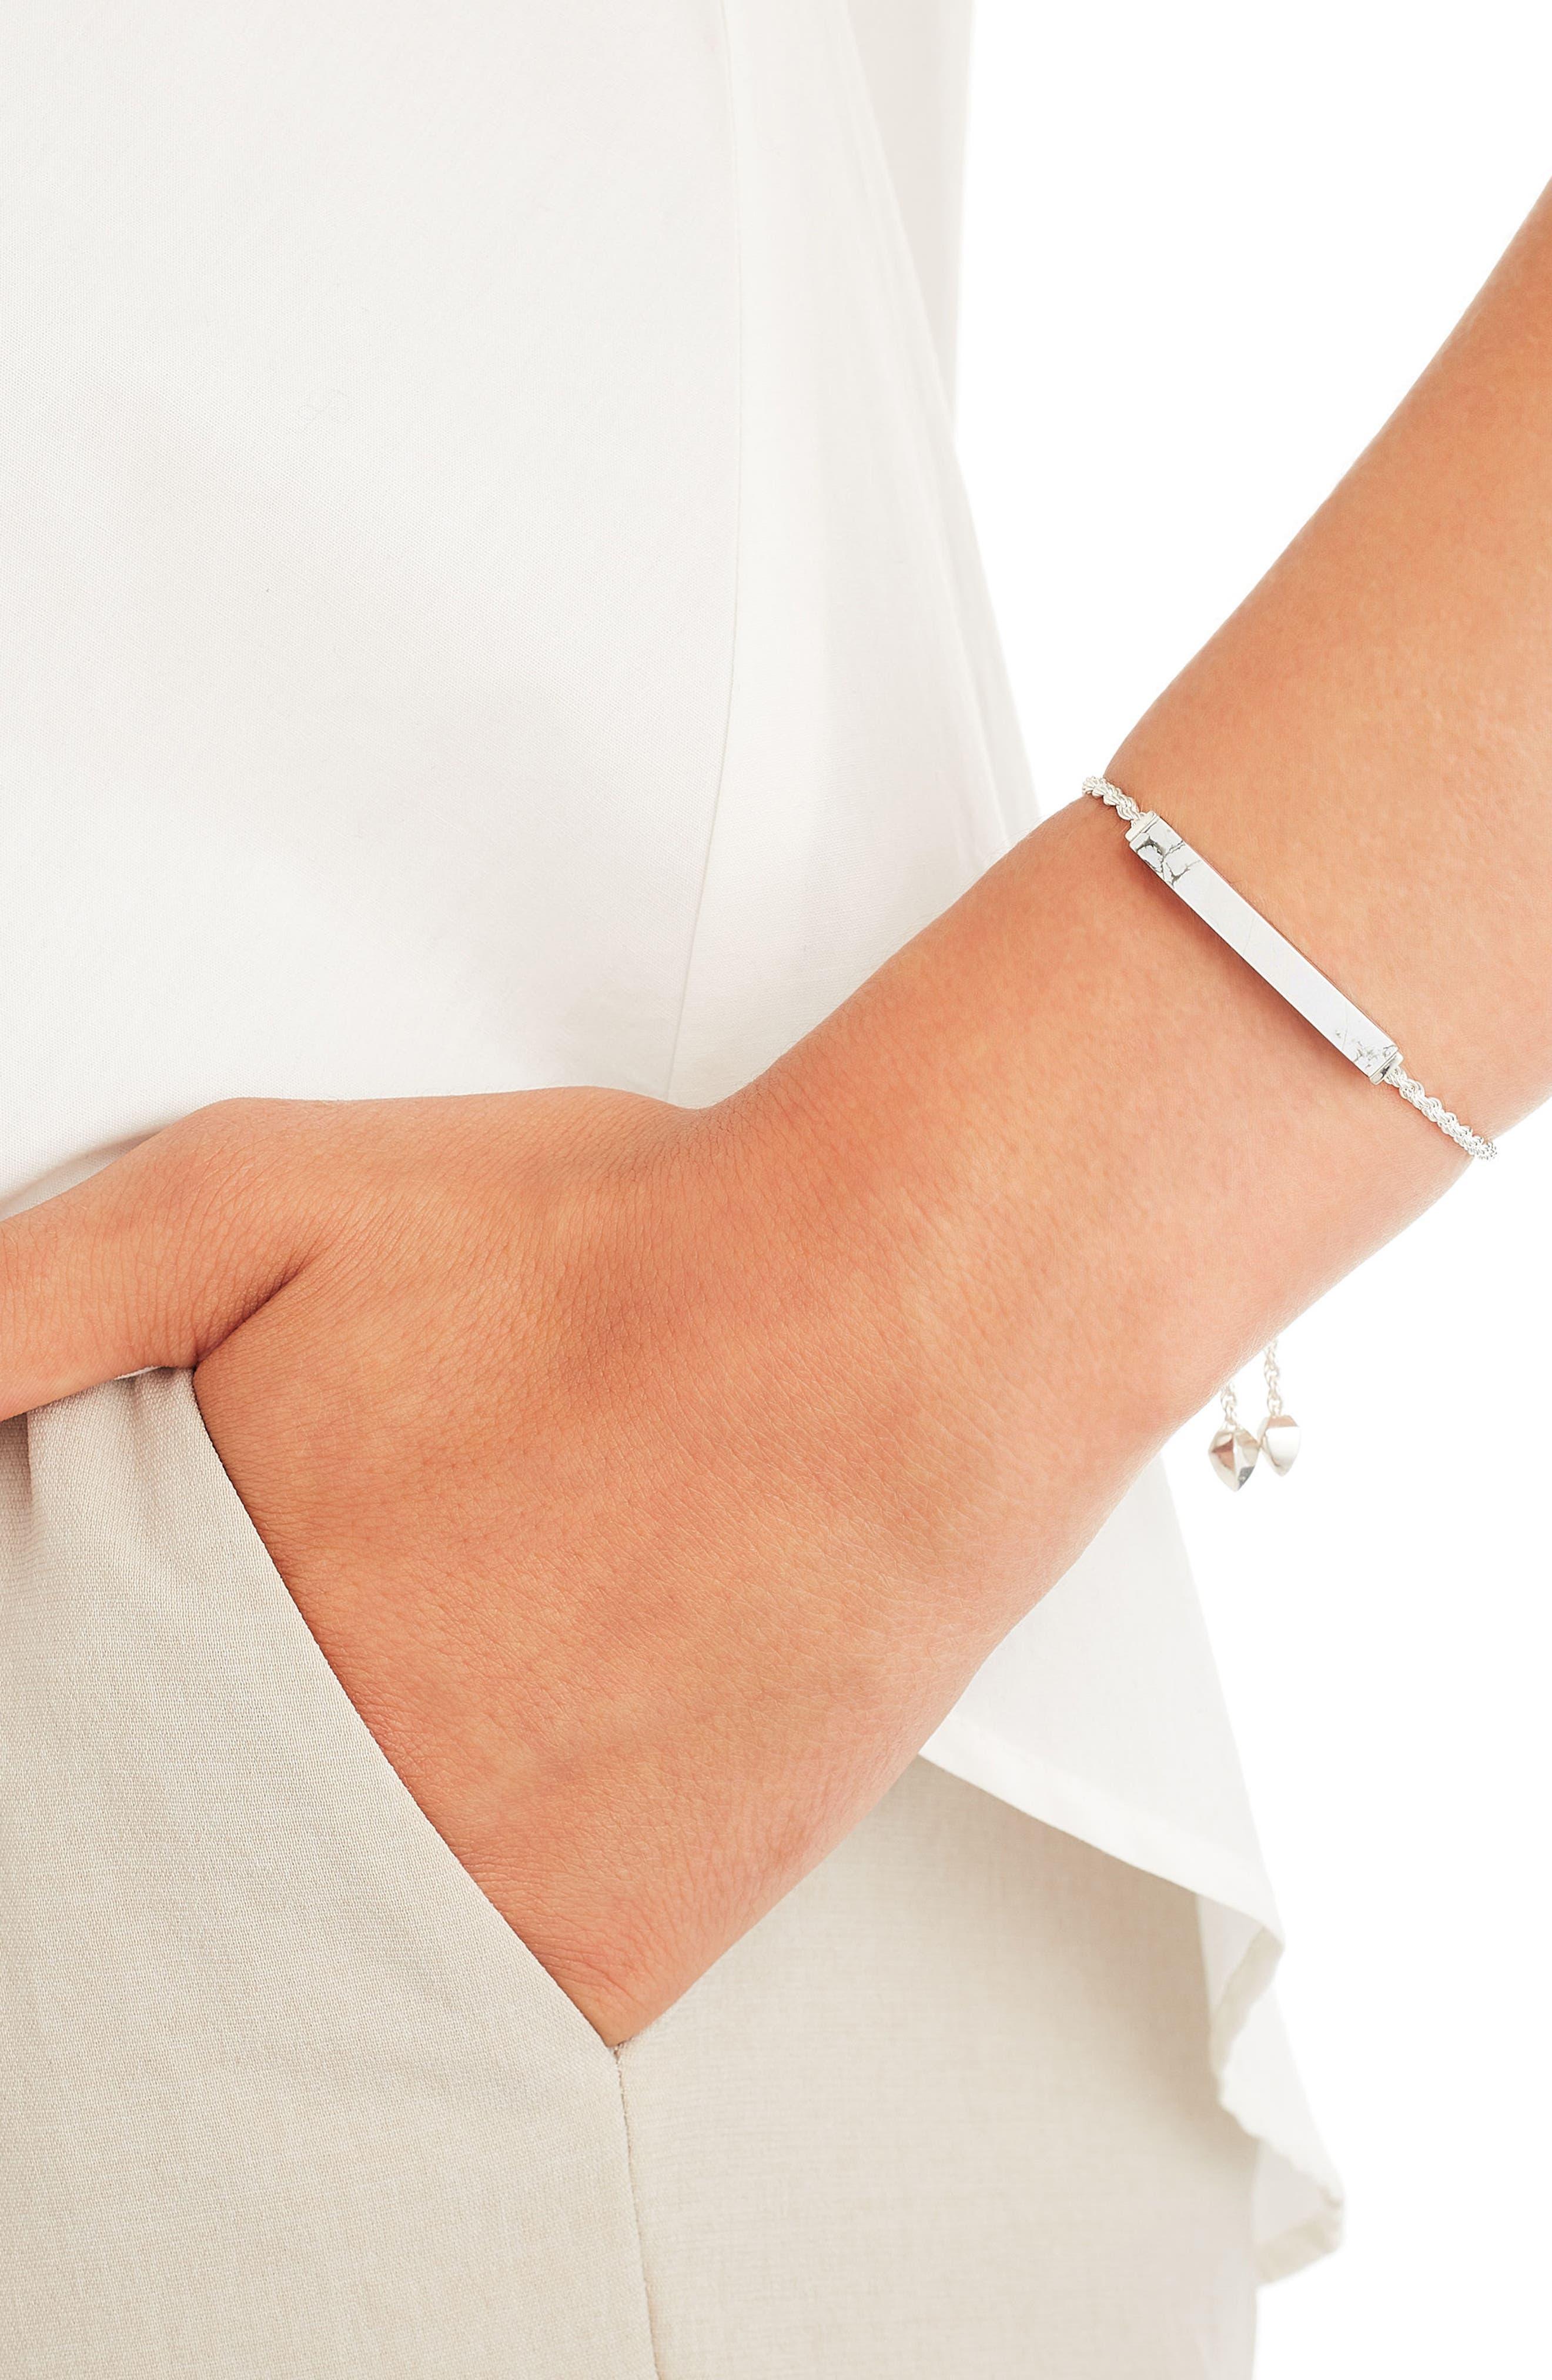 Engravable Linear Semiprecious Stone Friendship Bracelet,                             Alternate thumbnail 2, color,                             SILVER/ HOWLITE